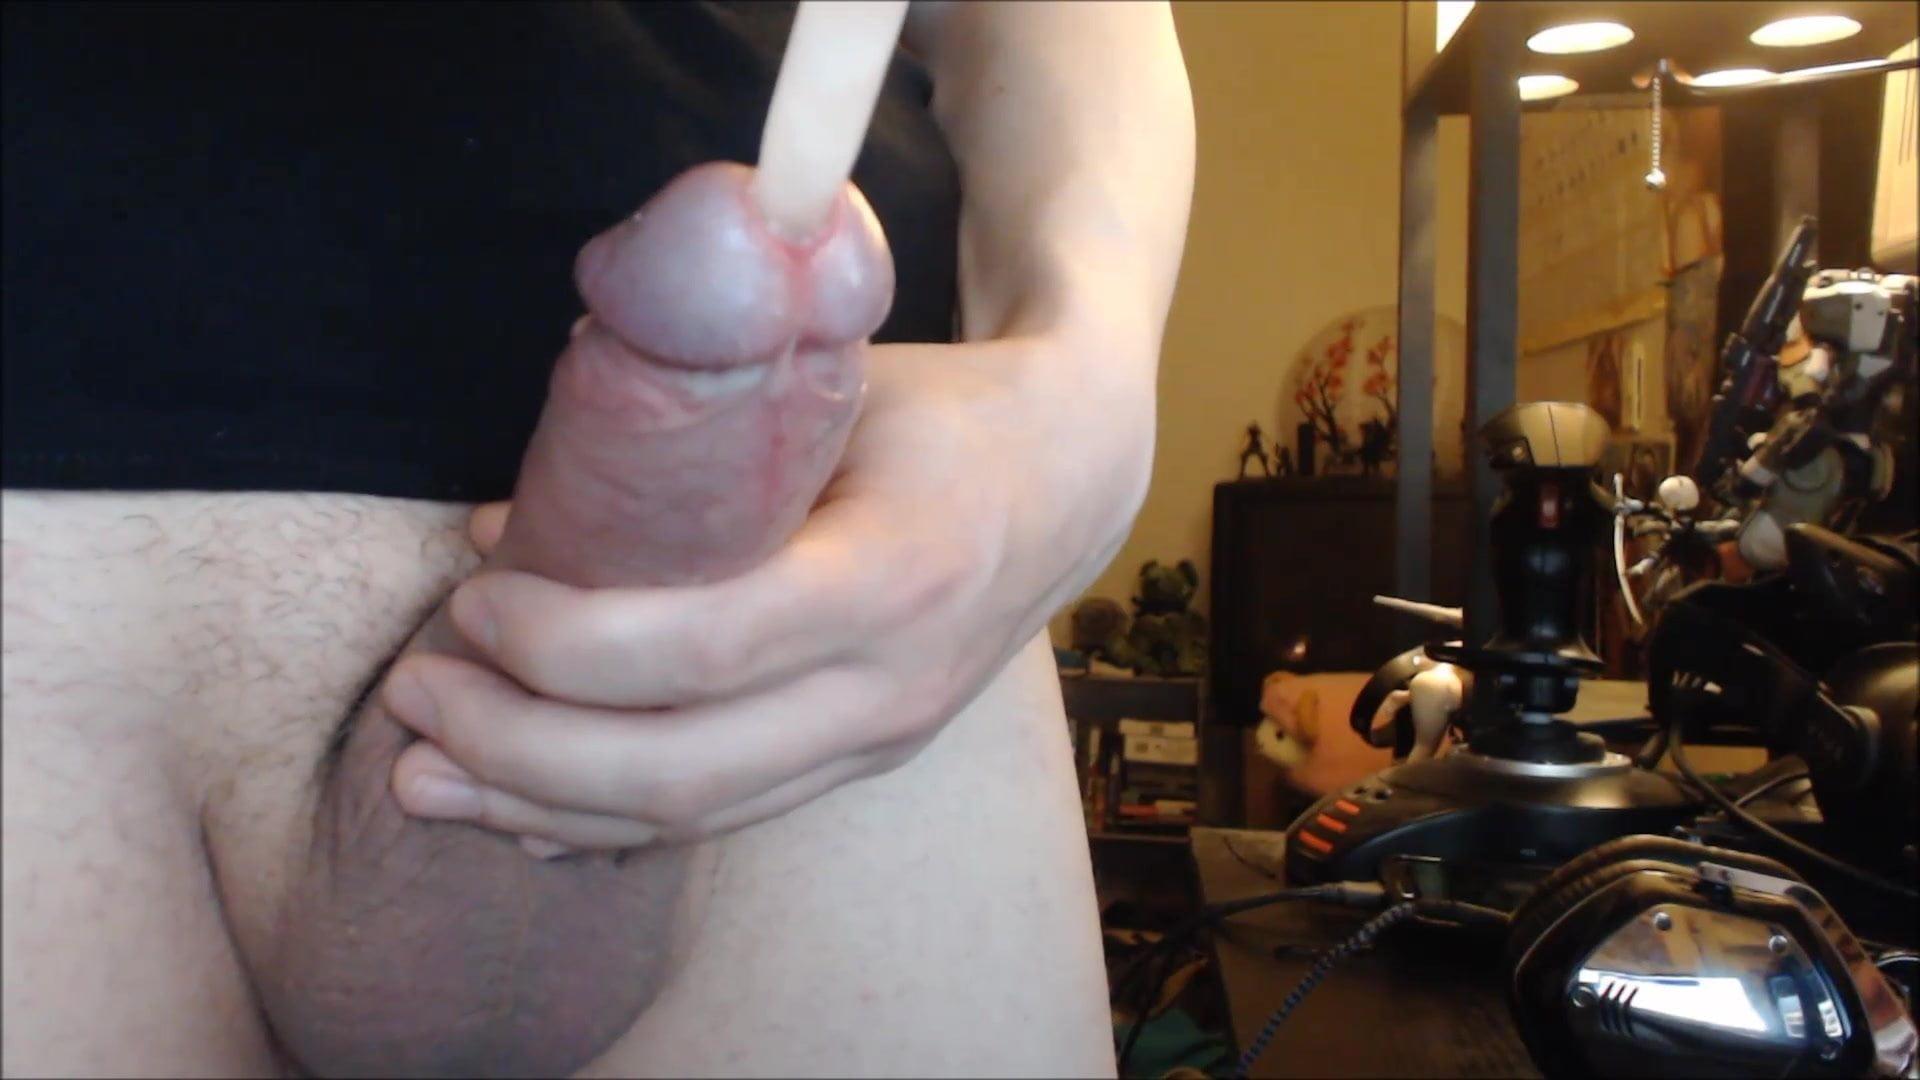 Sounding porn